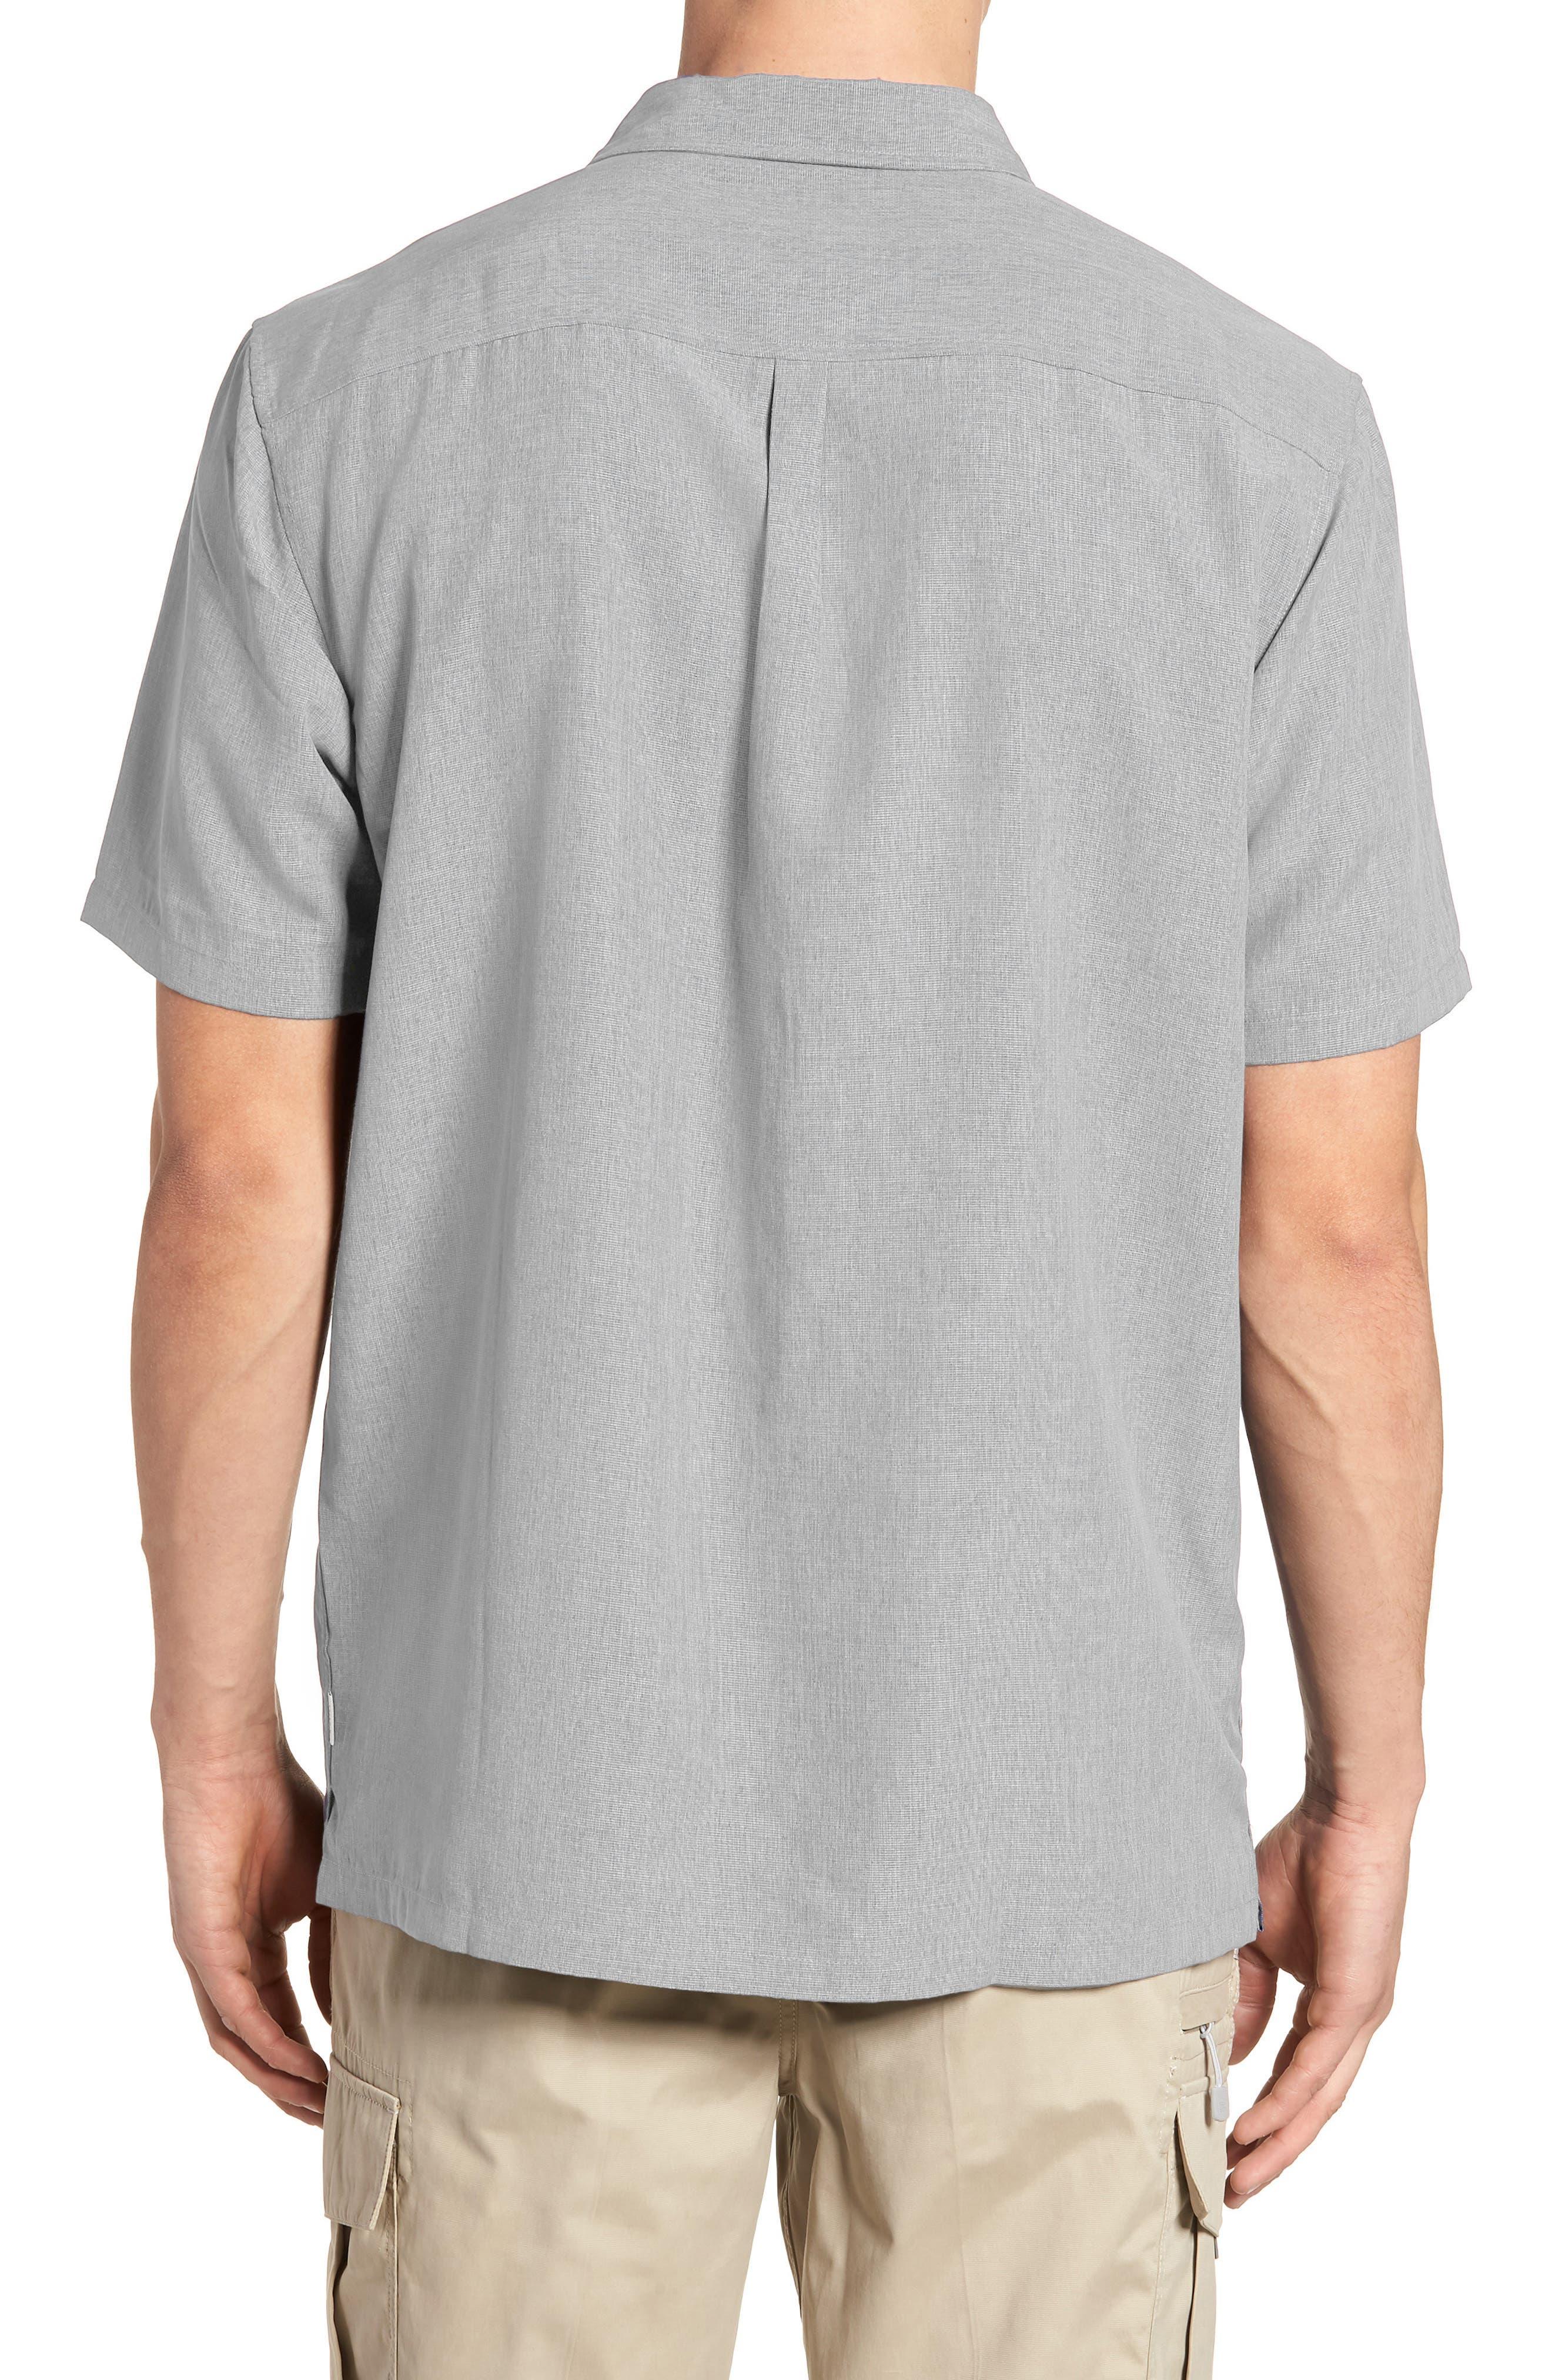 Liberty Regular Fit Short Sleeve Sport Shirt,                             Alternate thumbnail 10, color,                             Light Grey